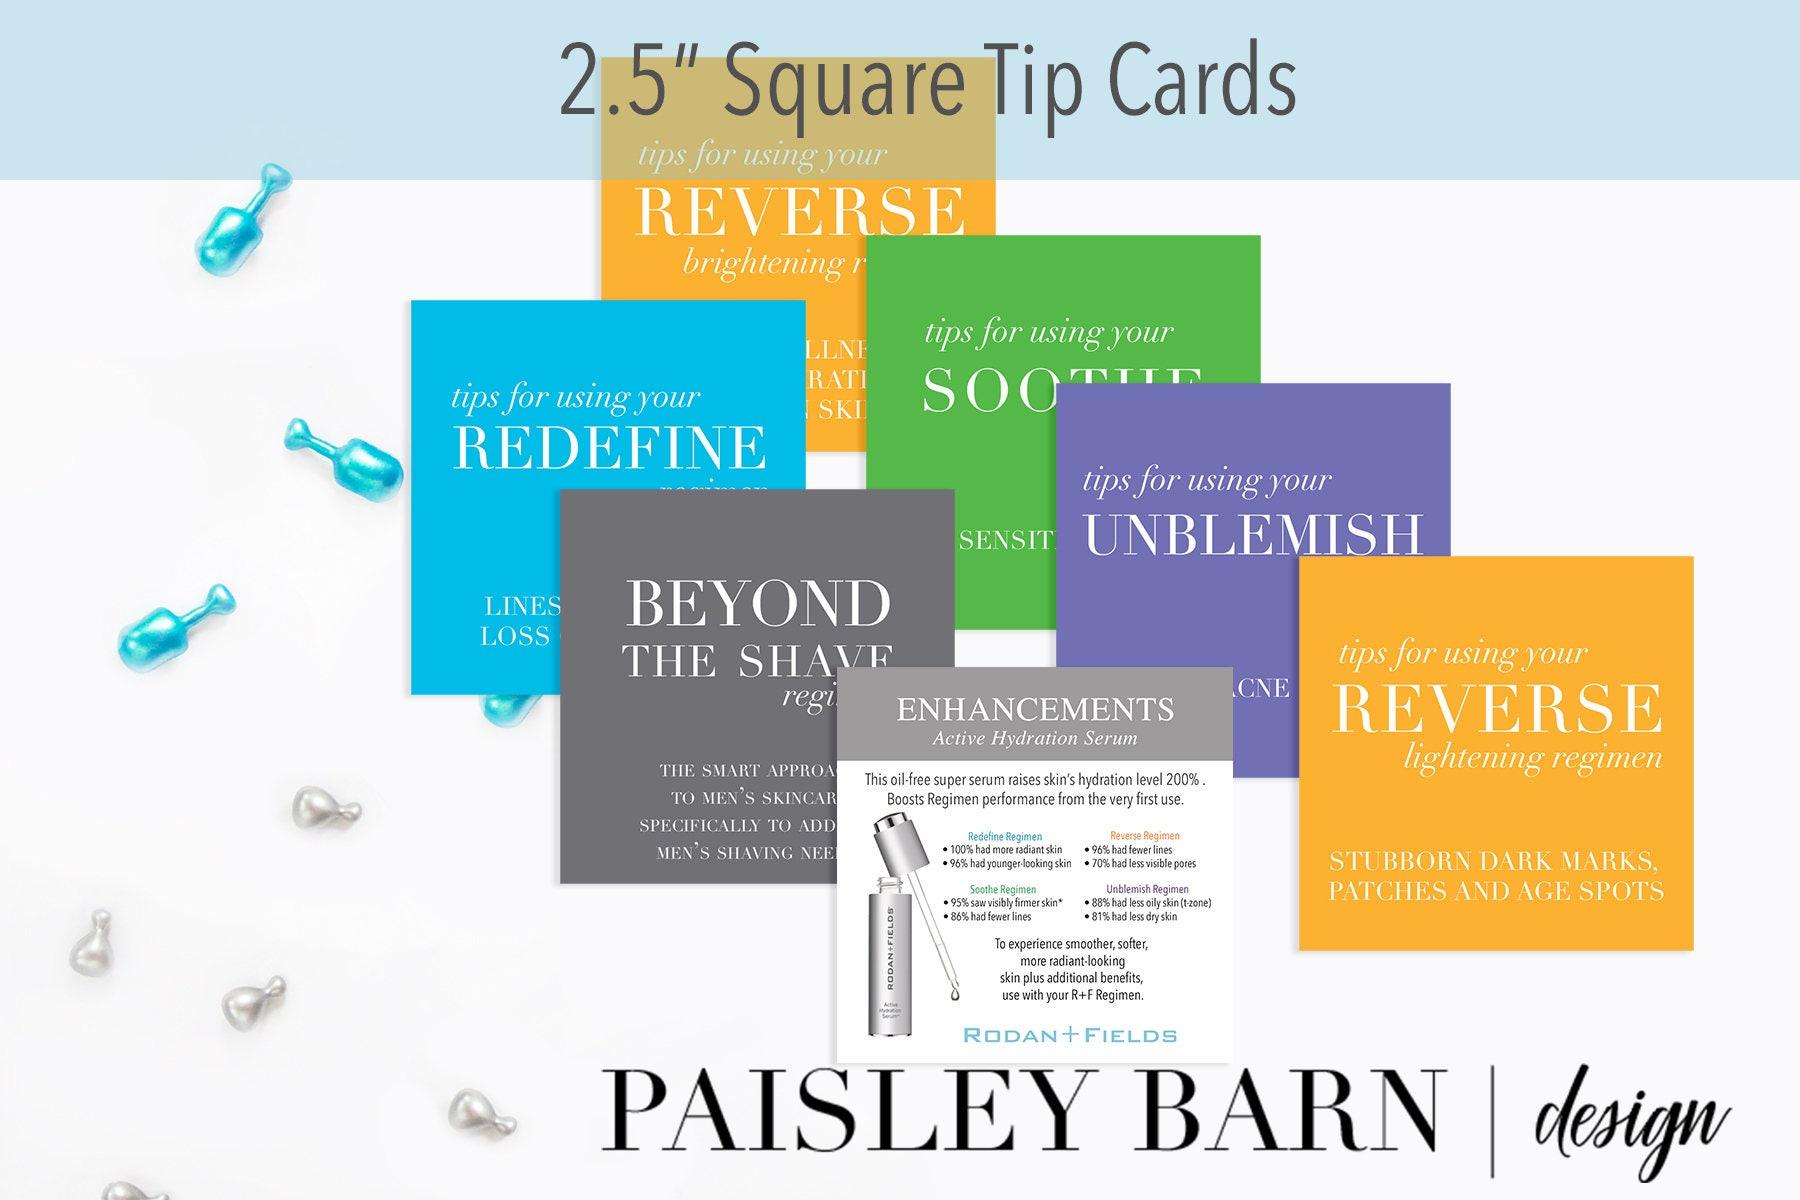 25 square tip cards mini facial rodan fields travel business 25 square tip cards mini facial rodan fields travel business card anti aging redefine sample skin reheart Gallery